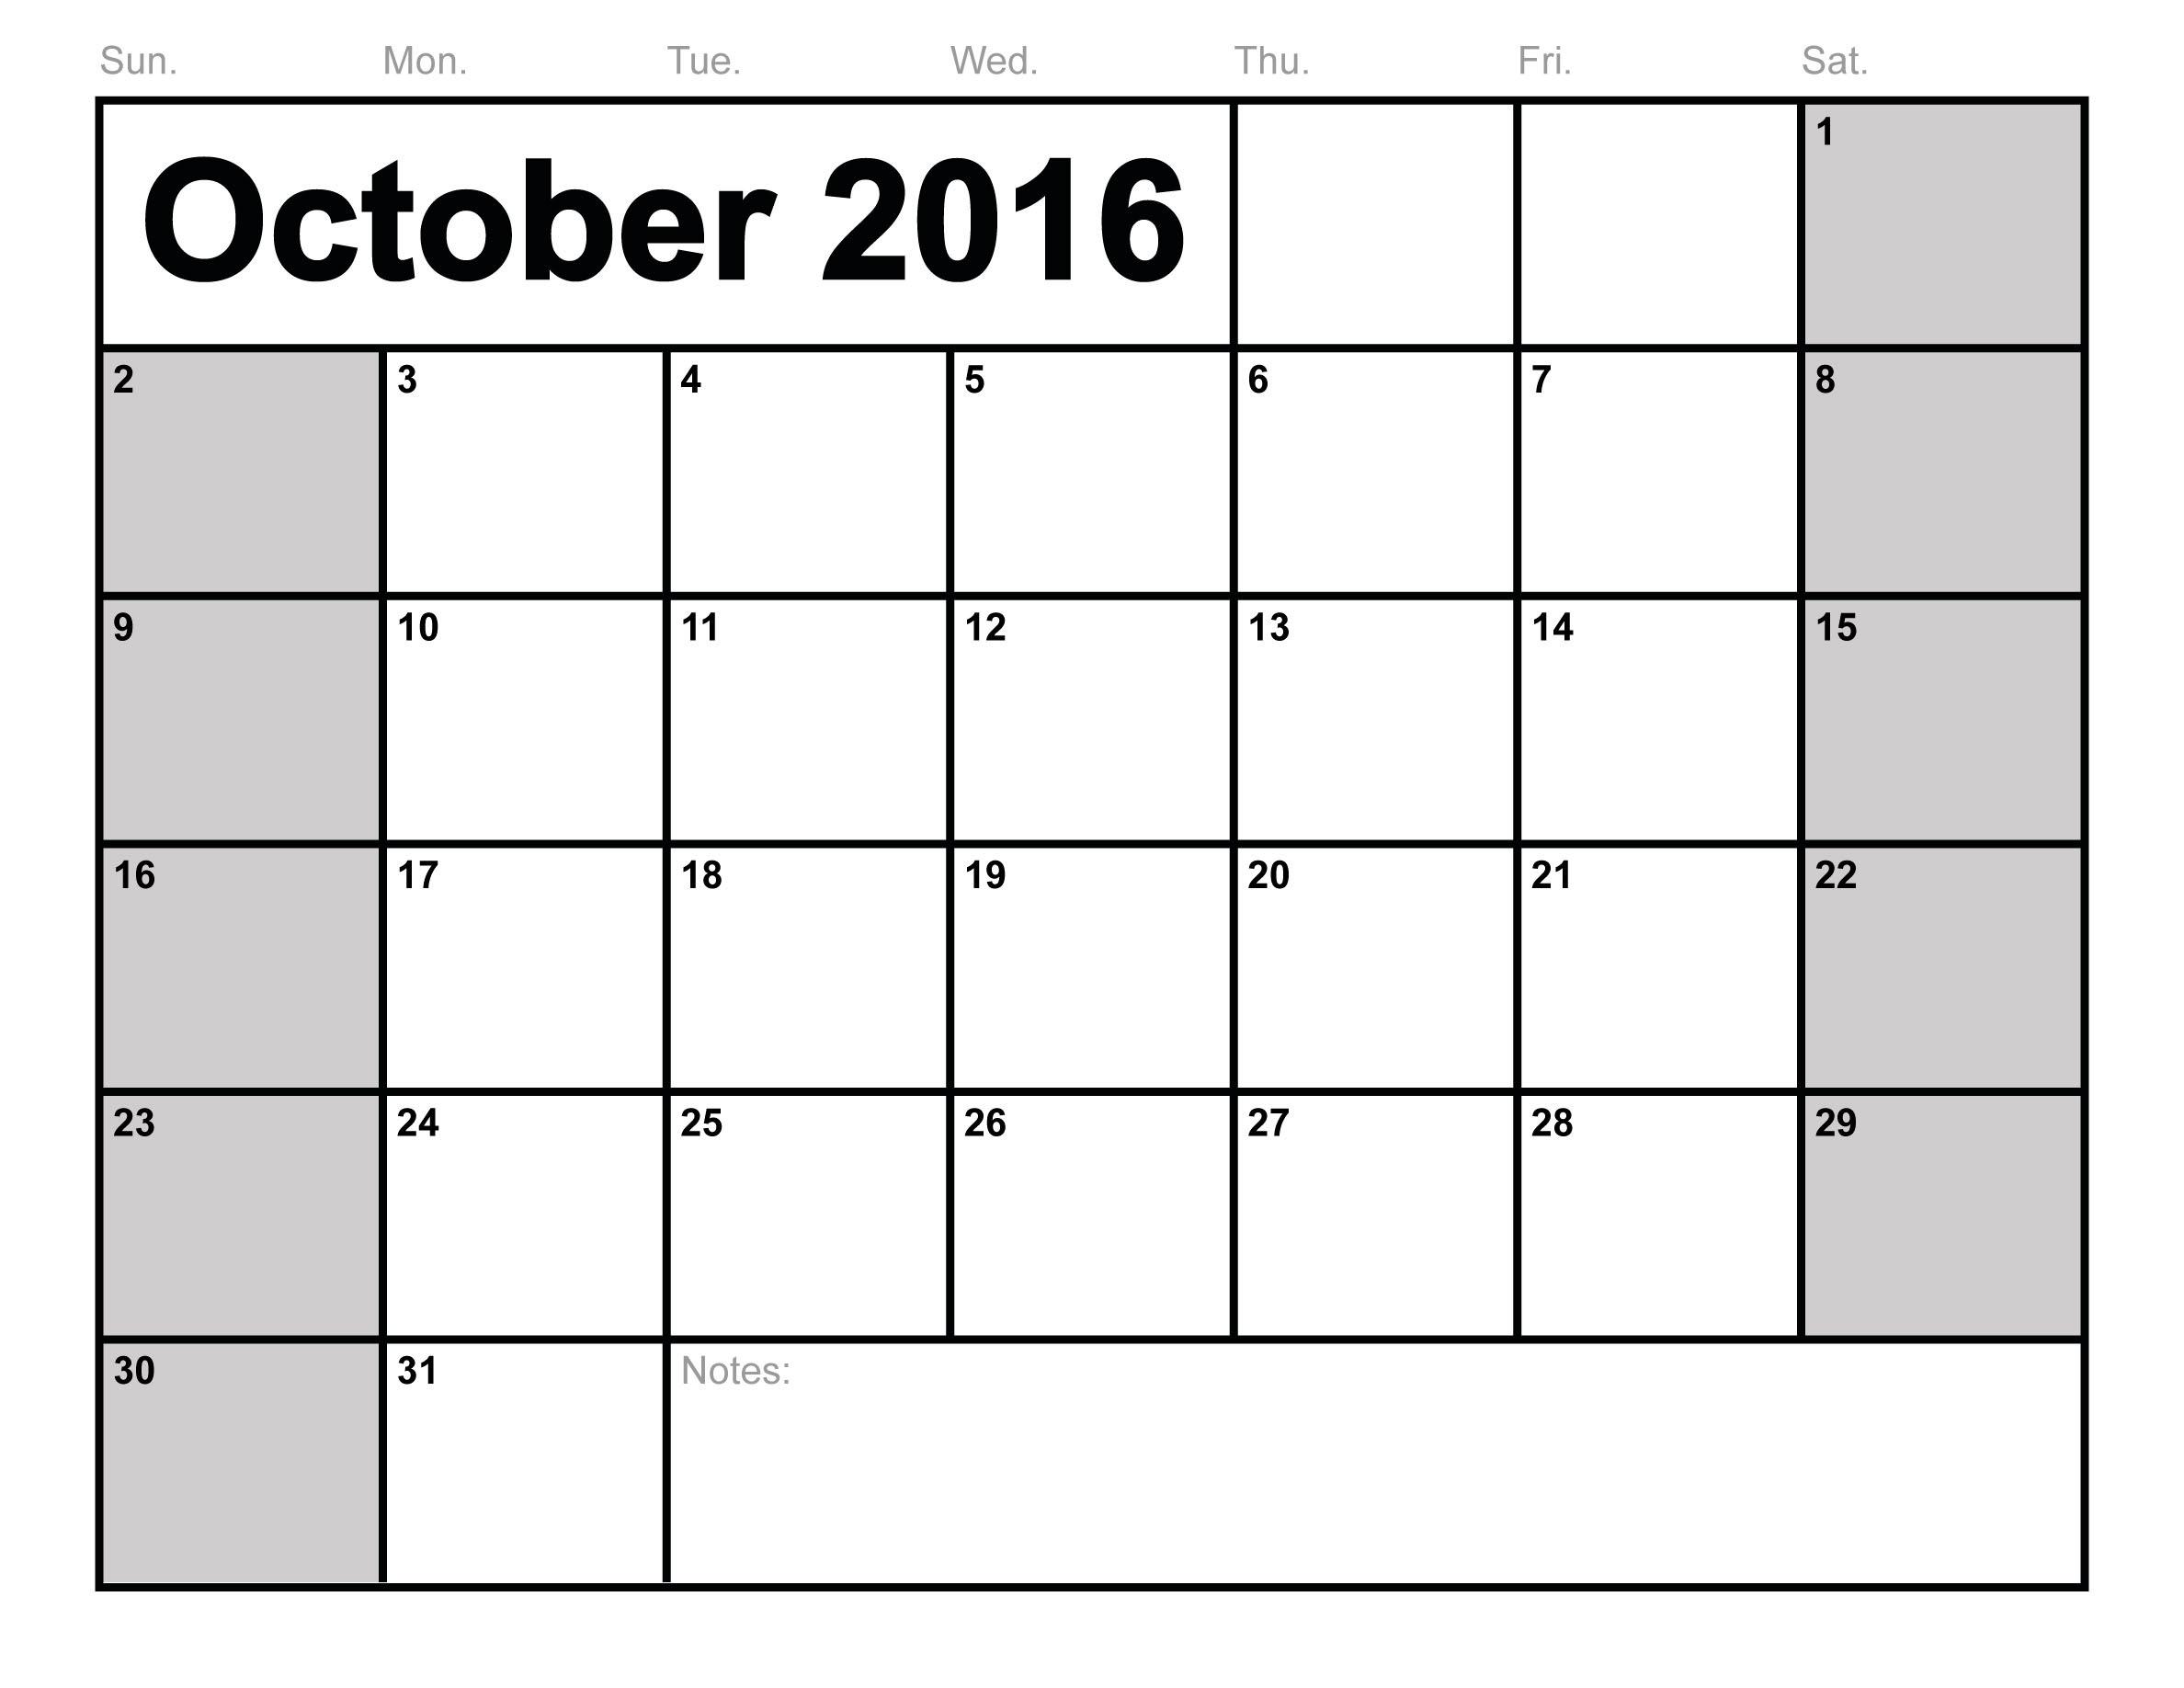 October 2016 Calendar word